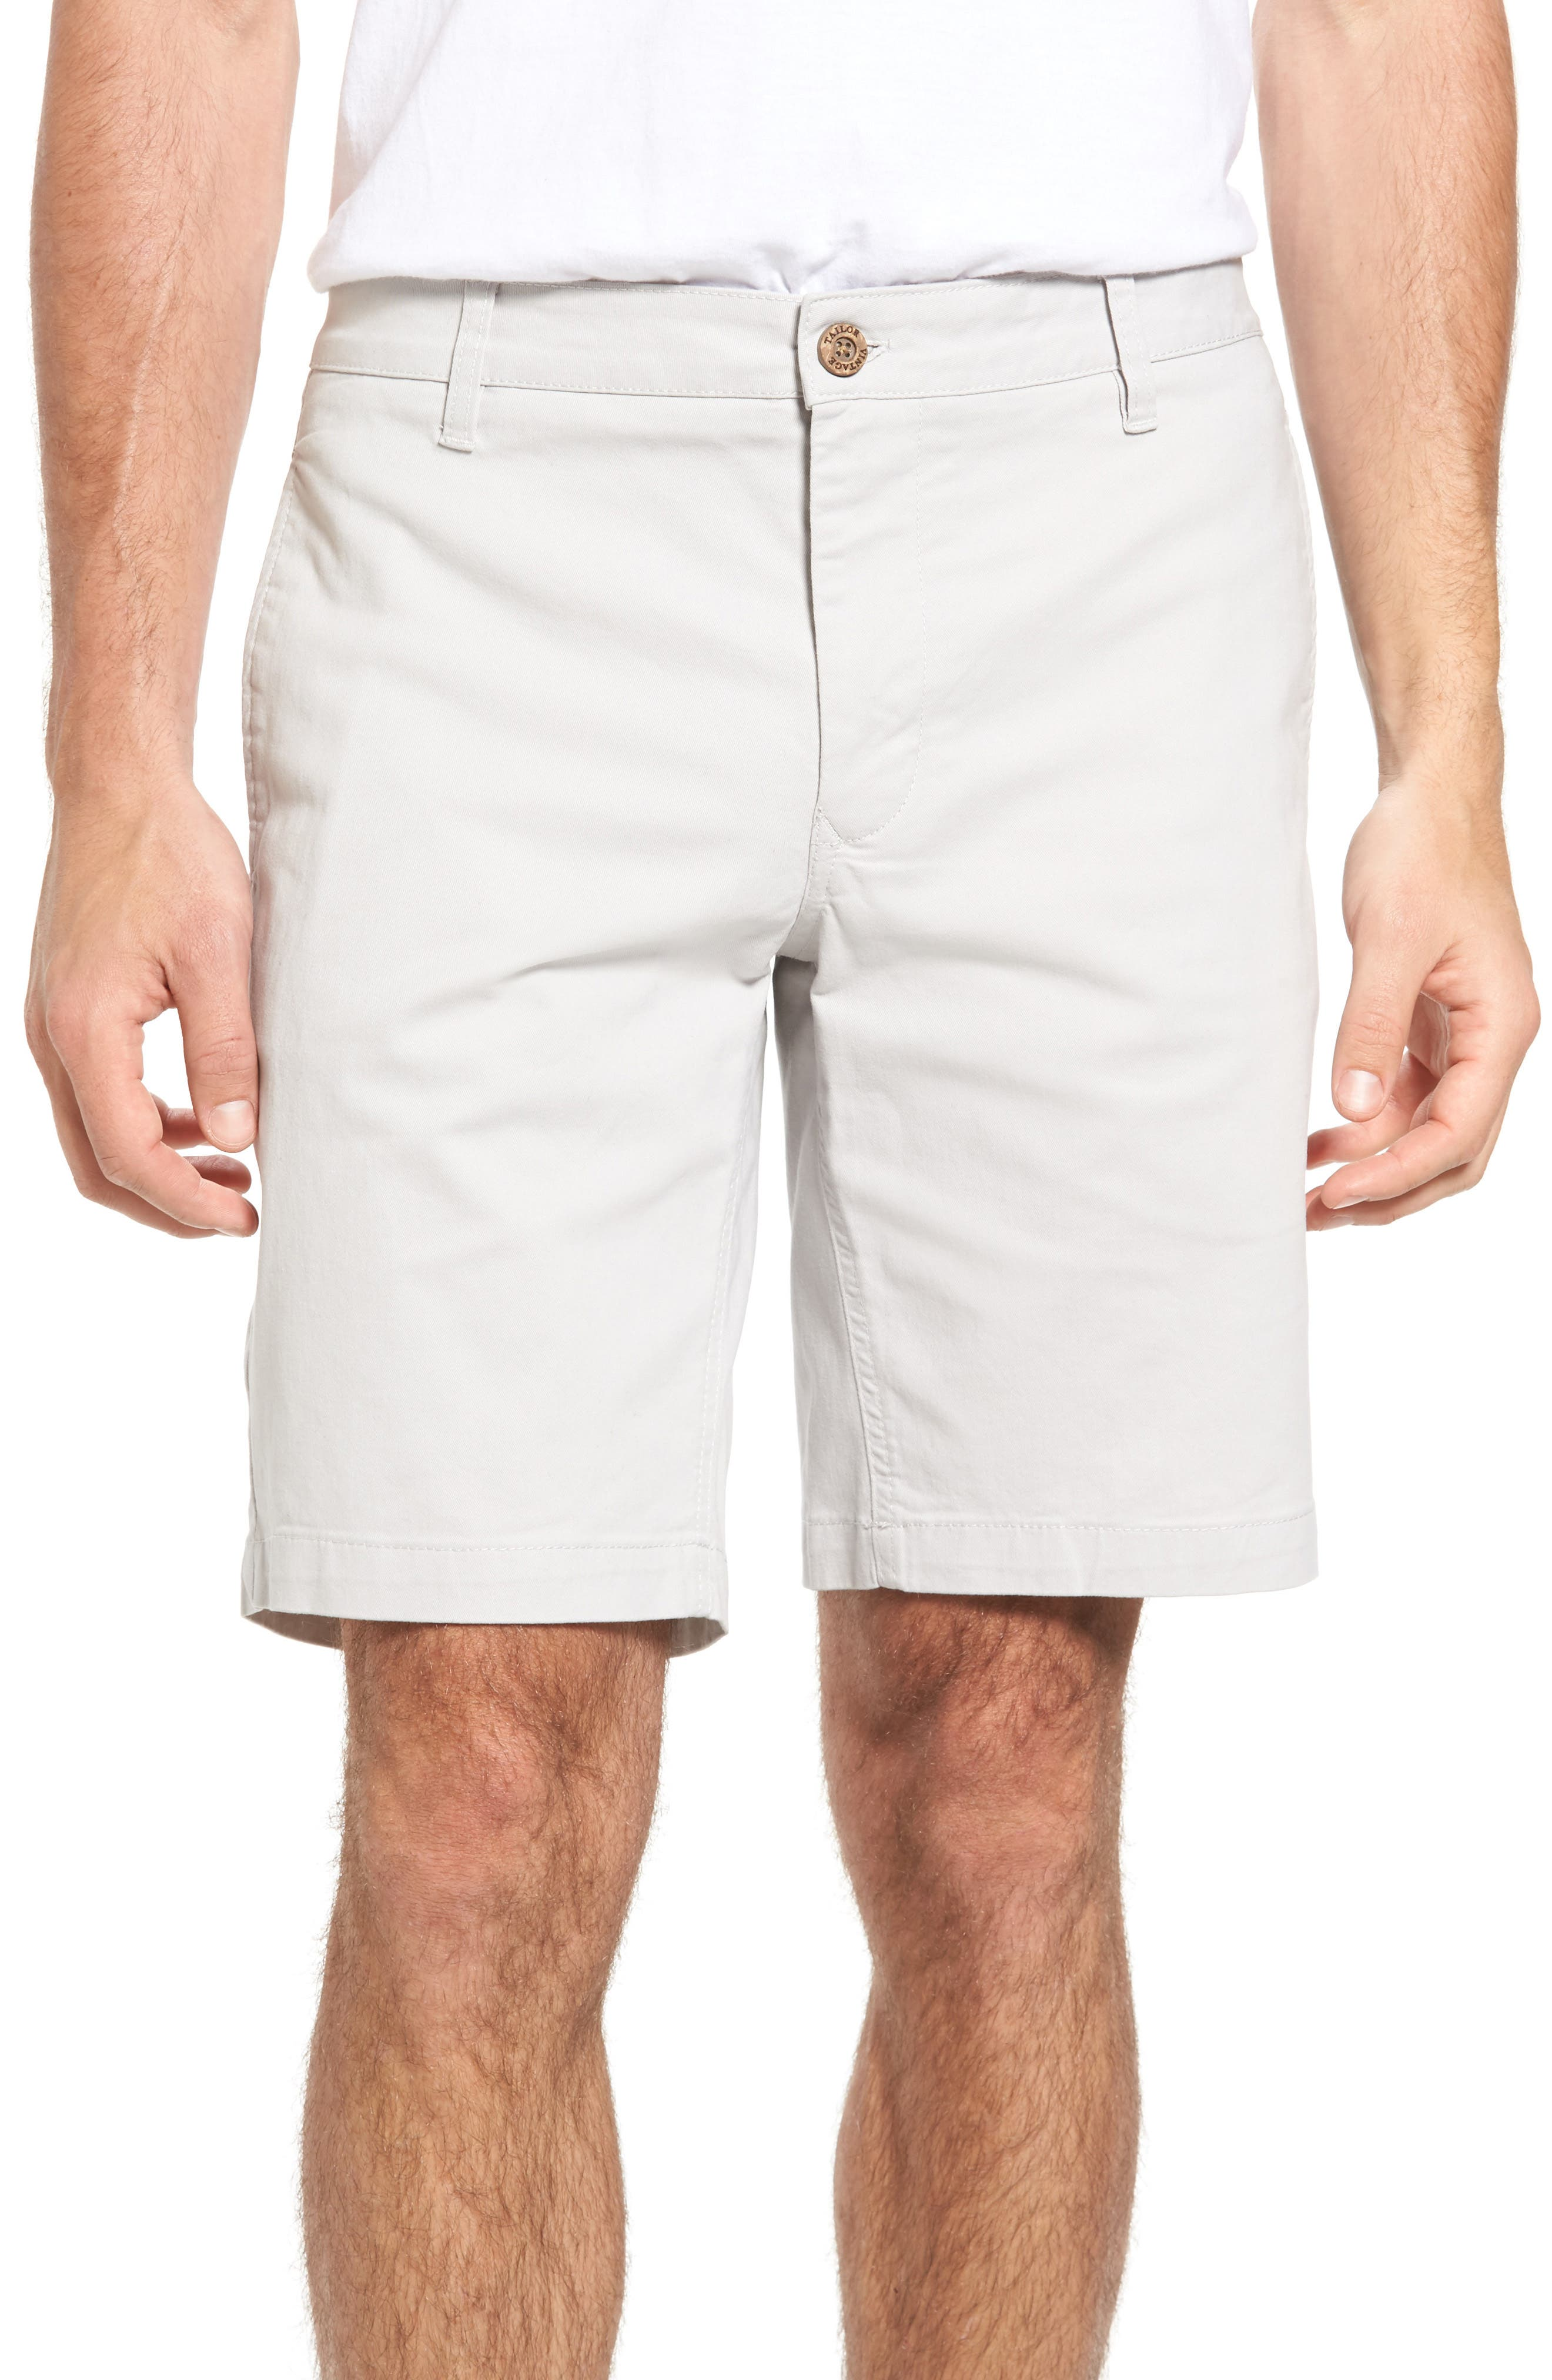 Stretch Twill Walking Shorts,                             Main thumbnail 1, color,                             050